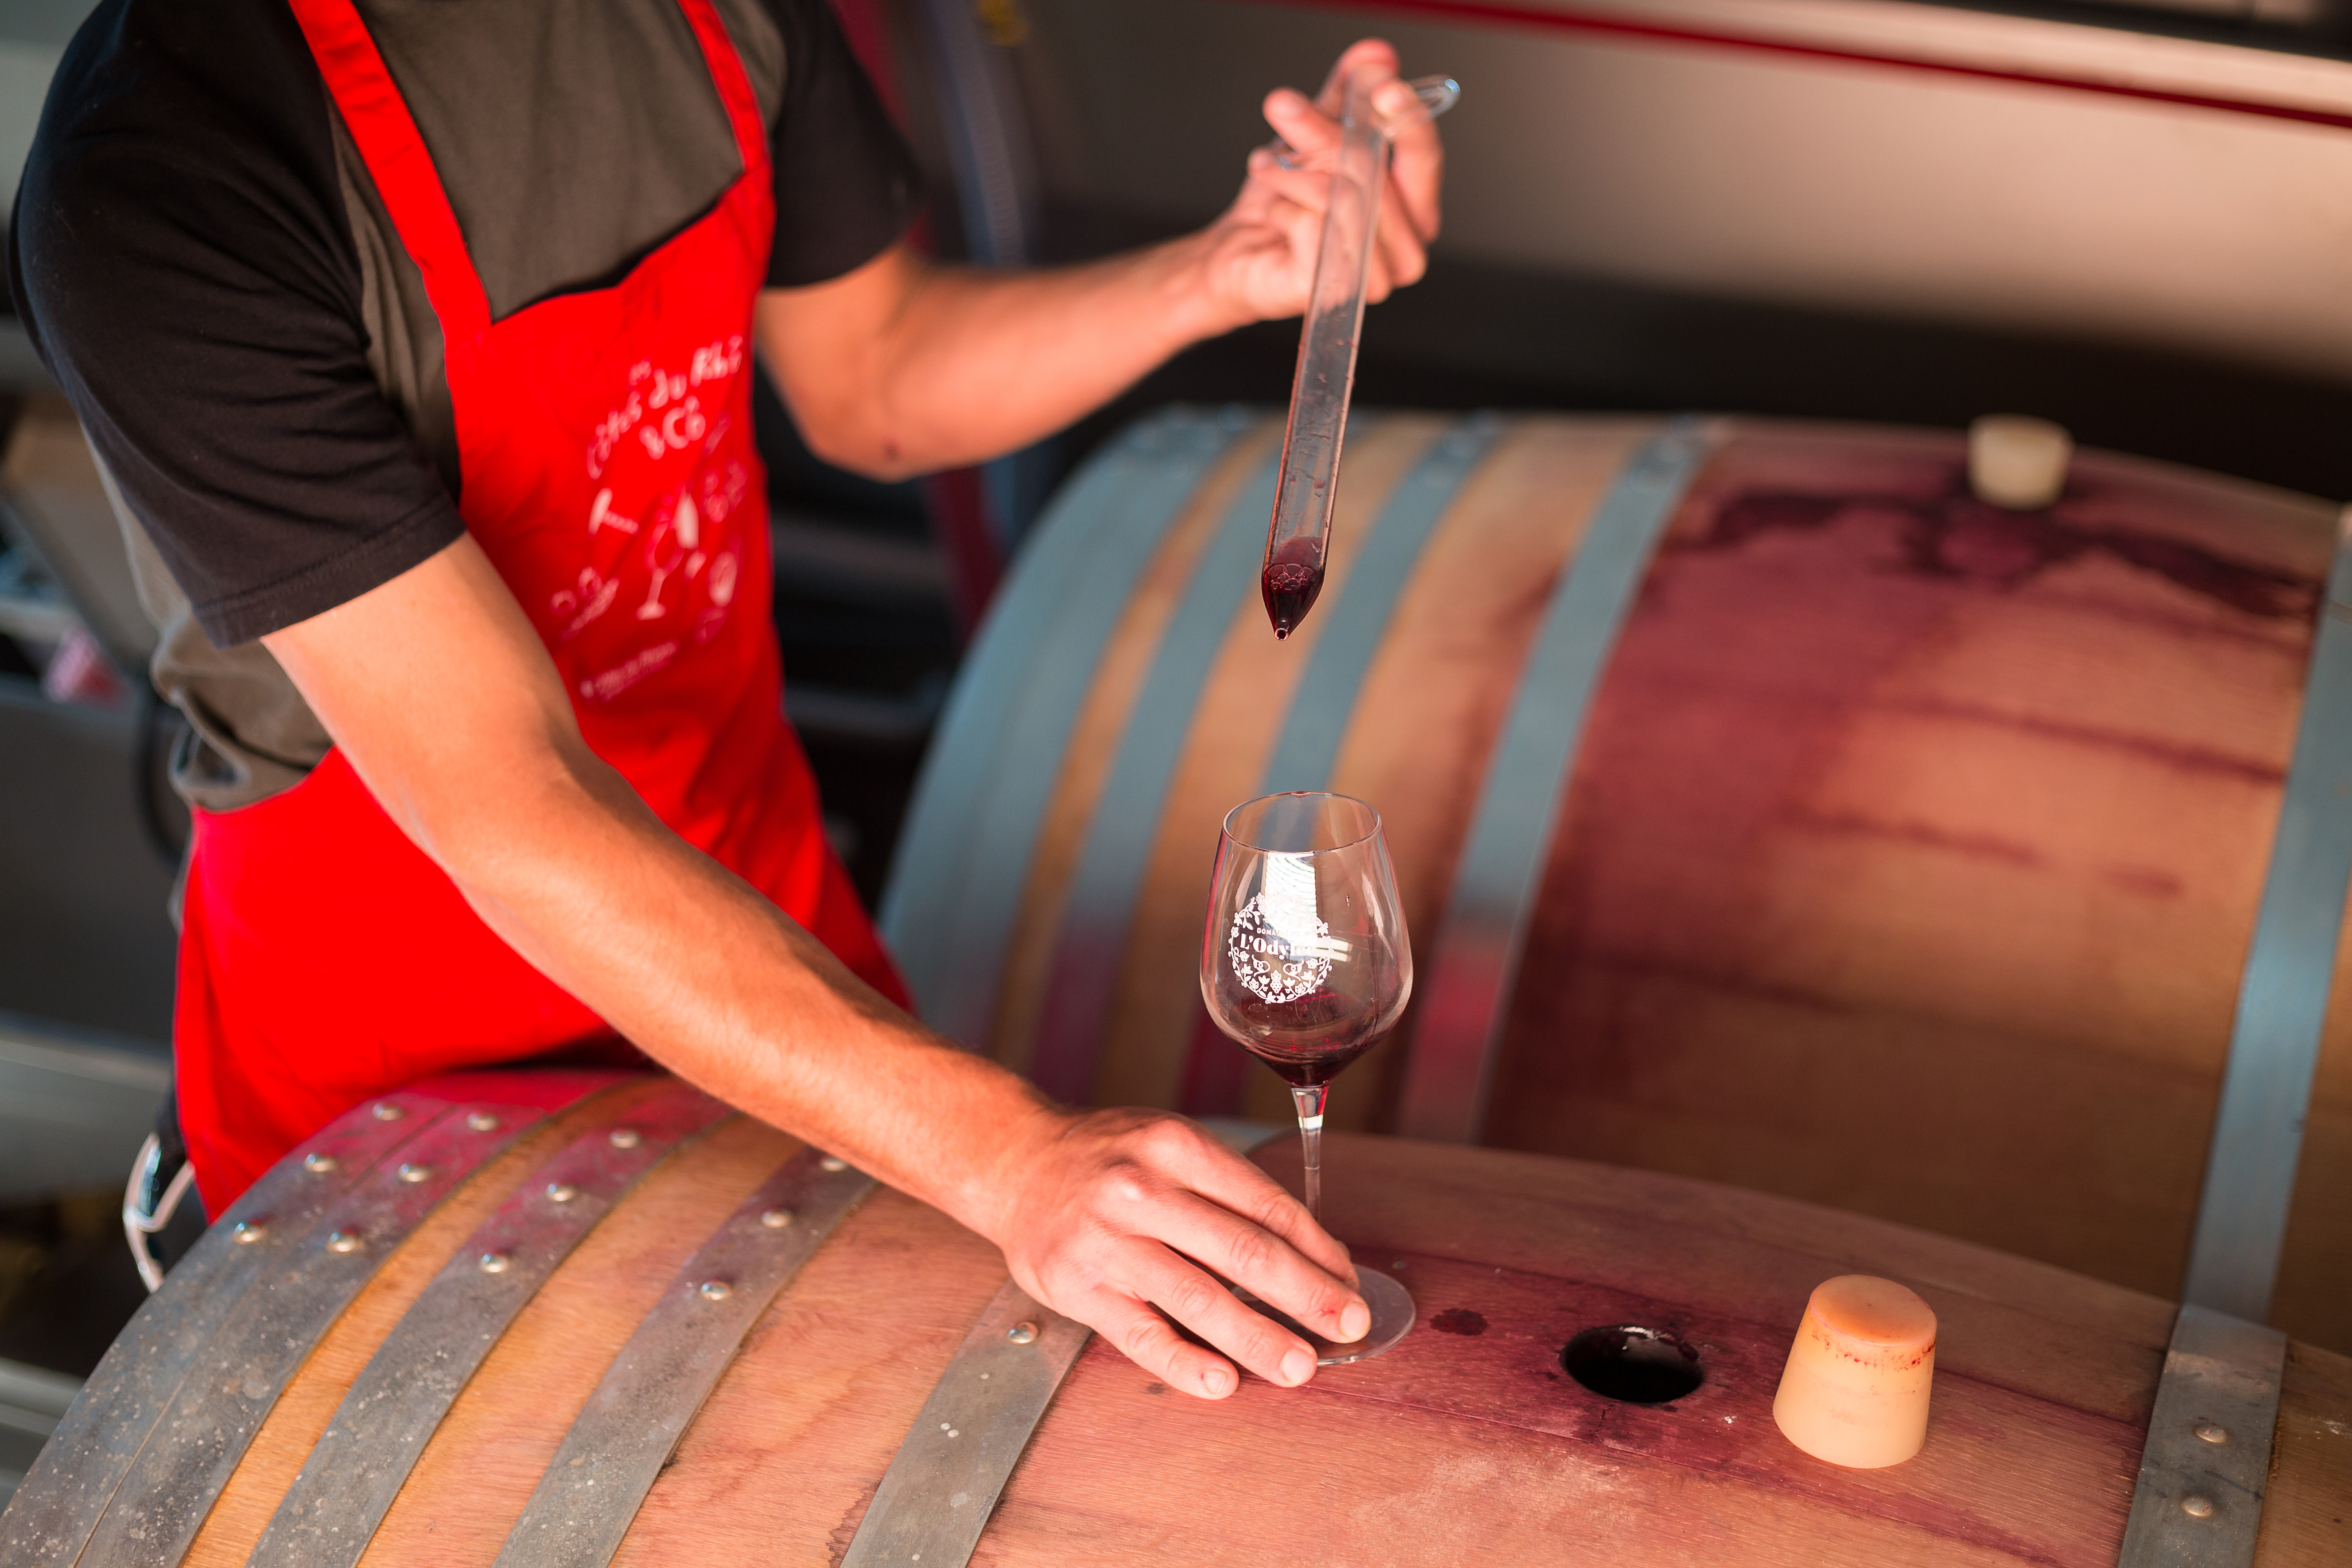 Taste the red wine for the oak barrels